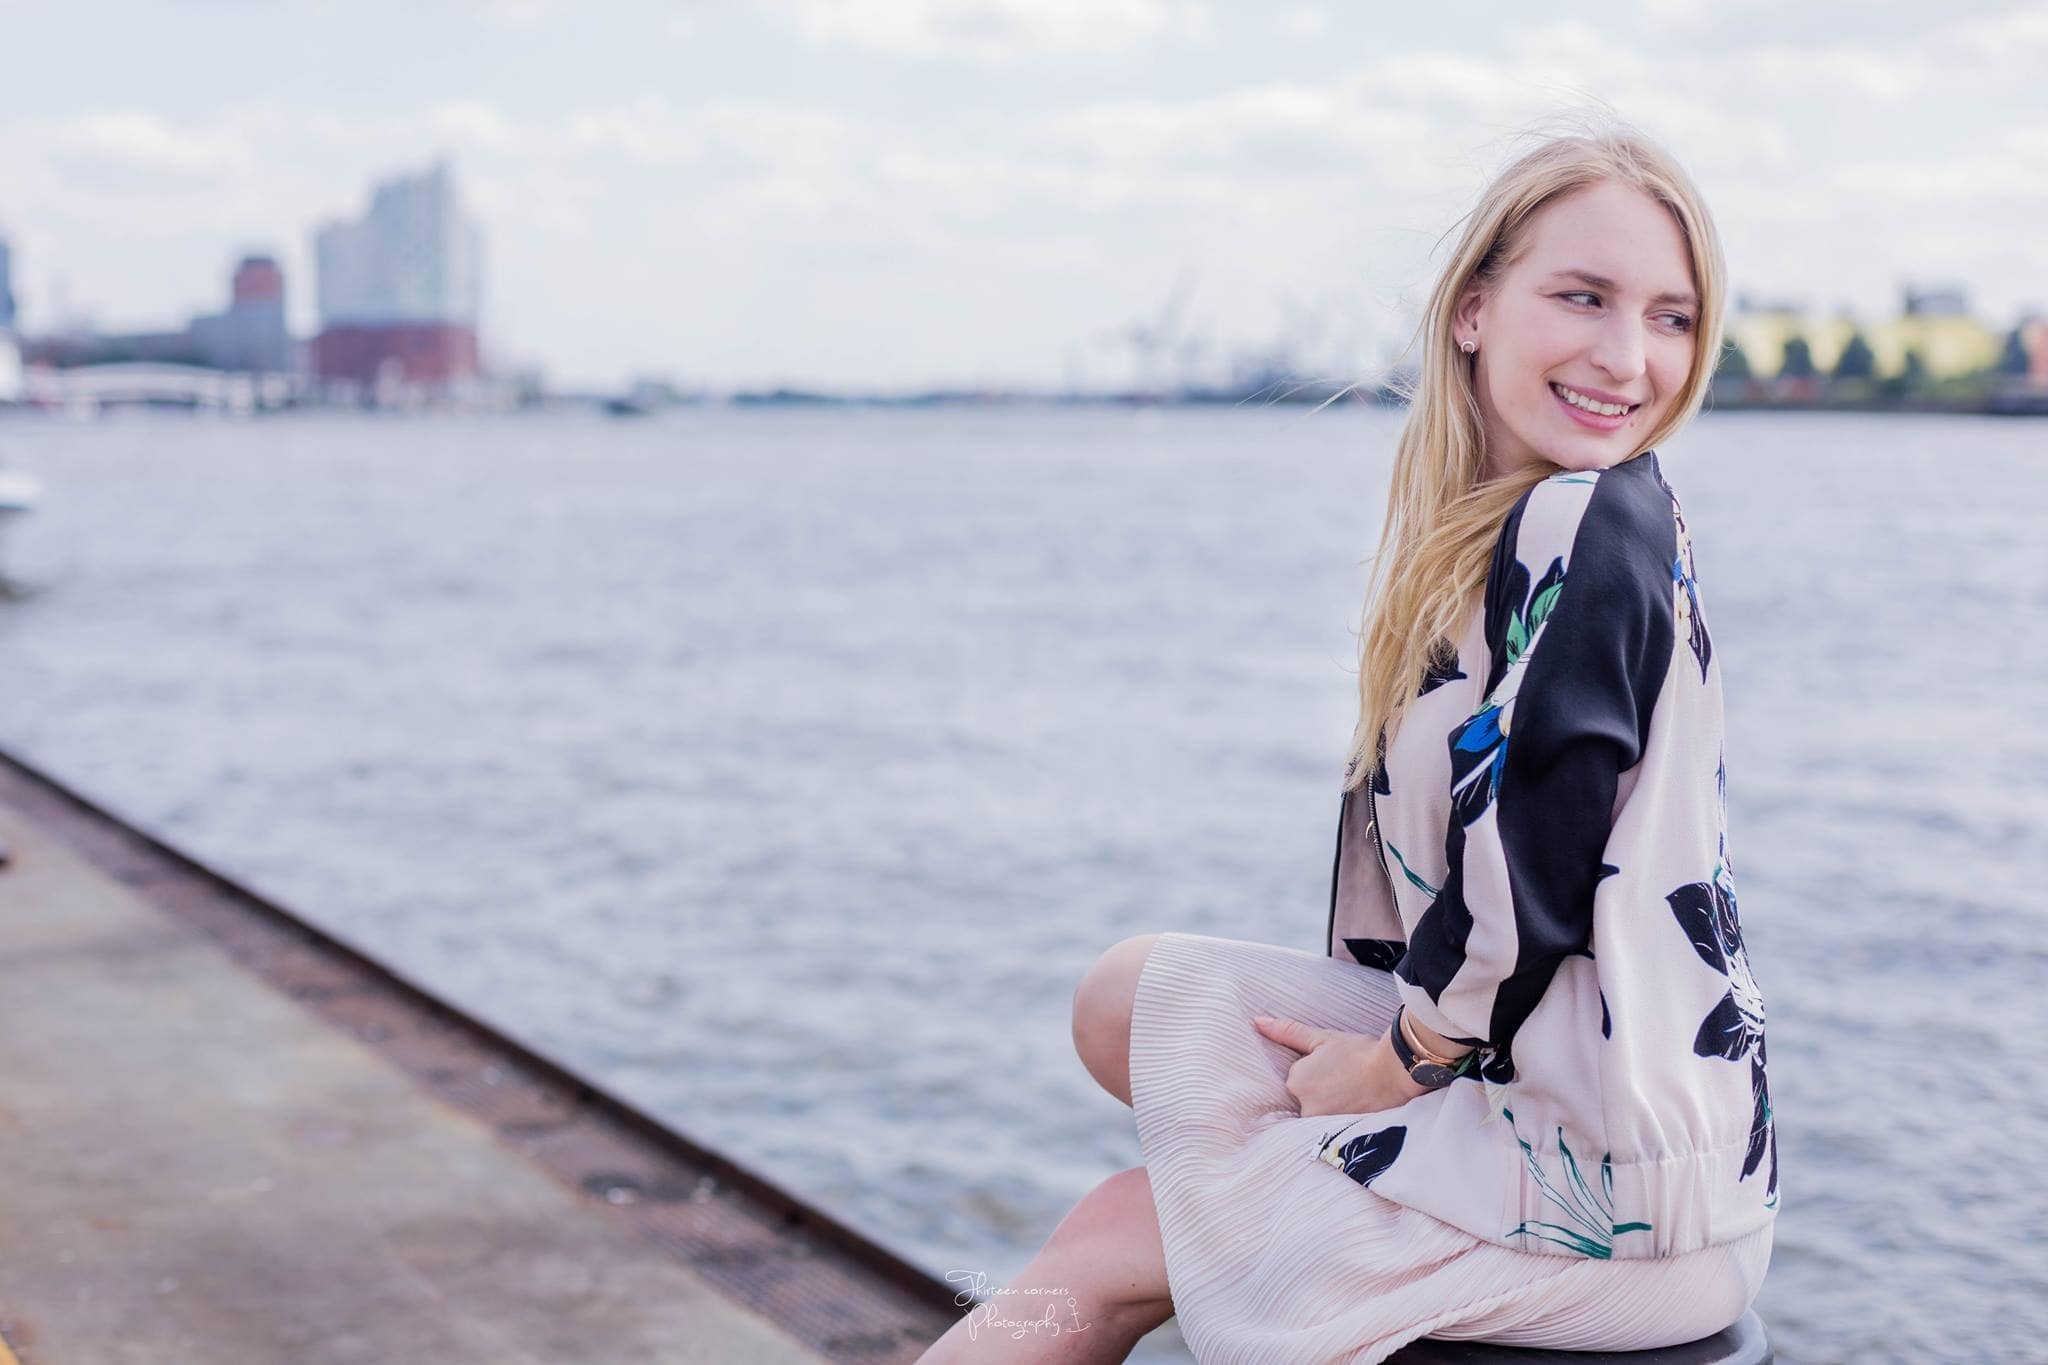 Hamburgliebe: Lieblingsort Hafen